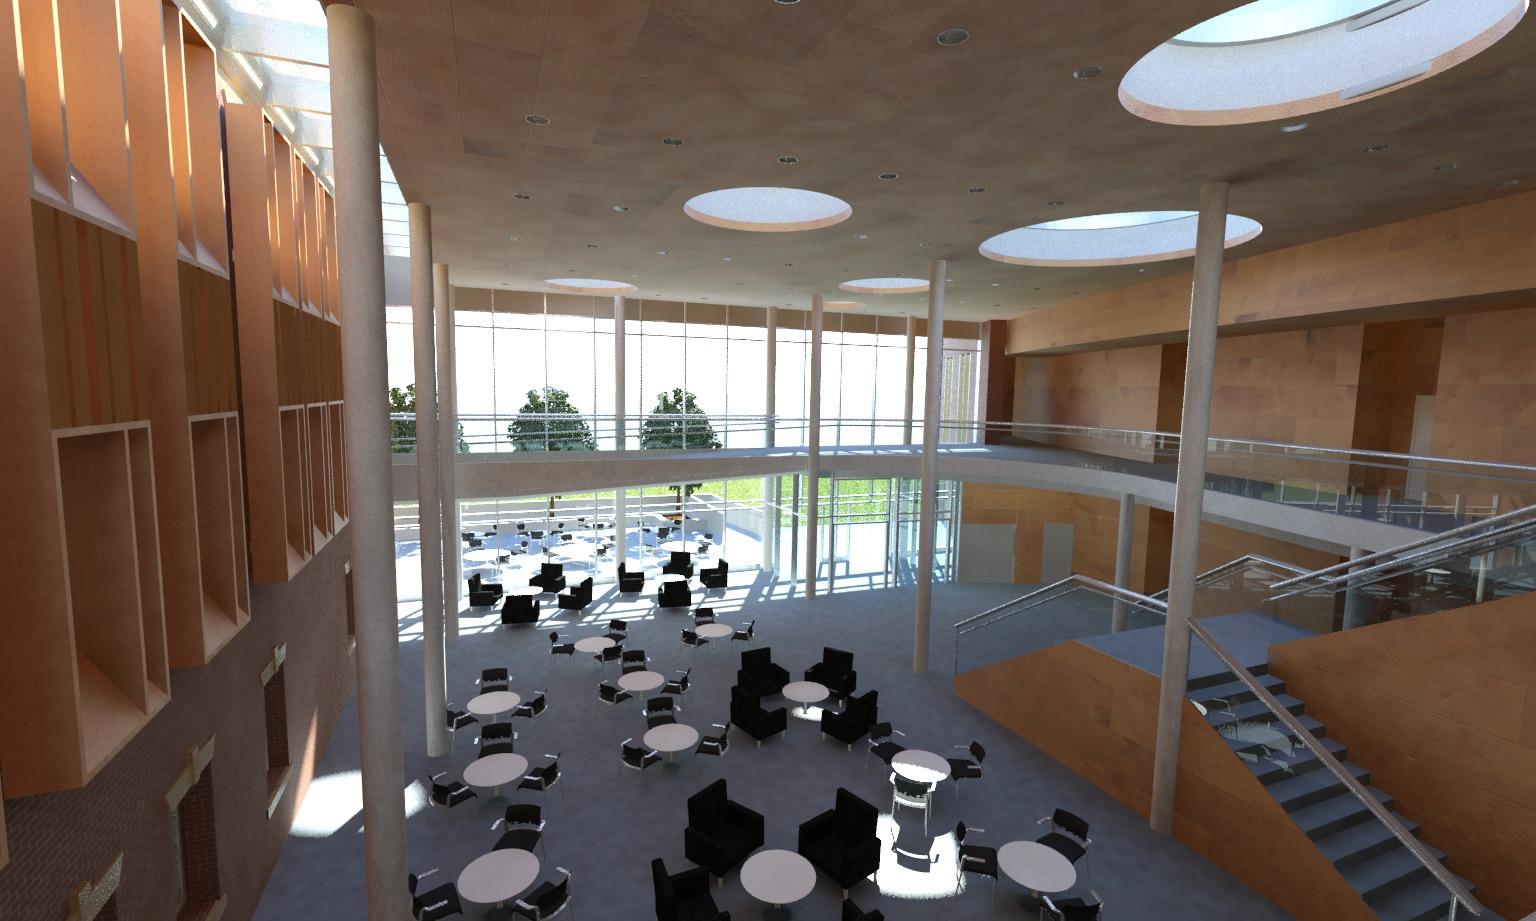 Classroom with Daylighting